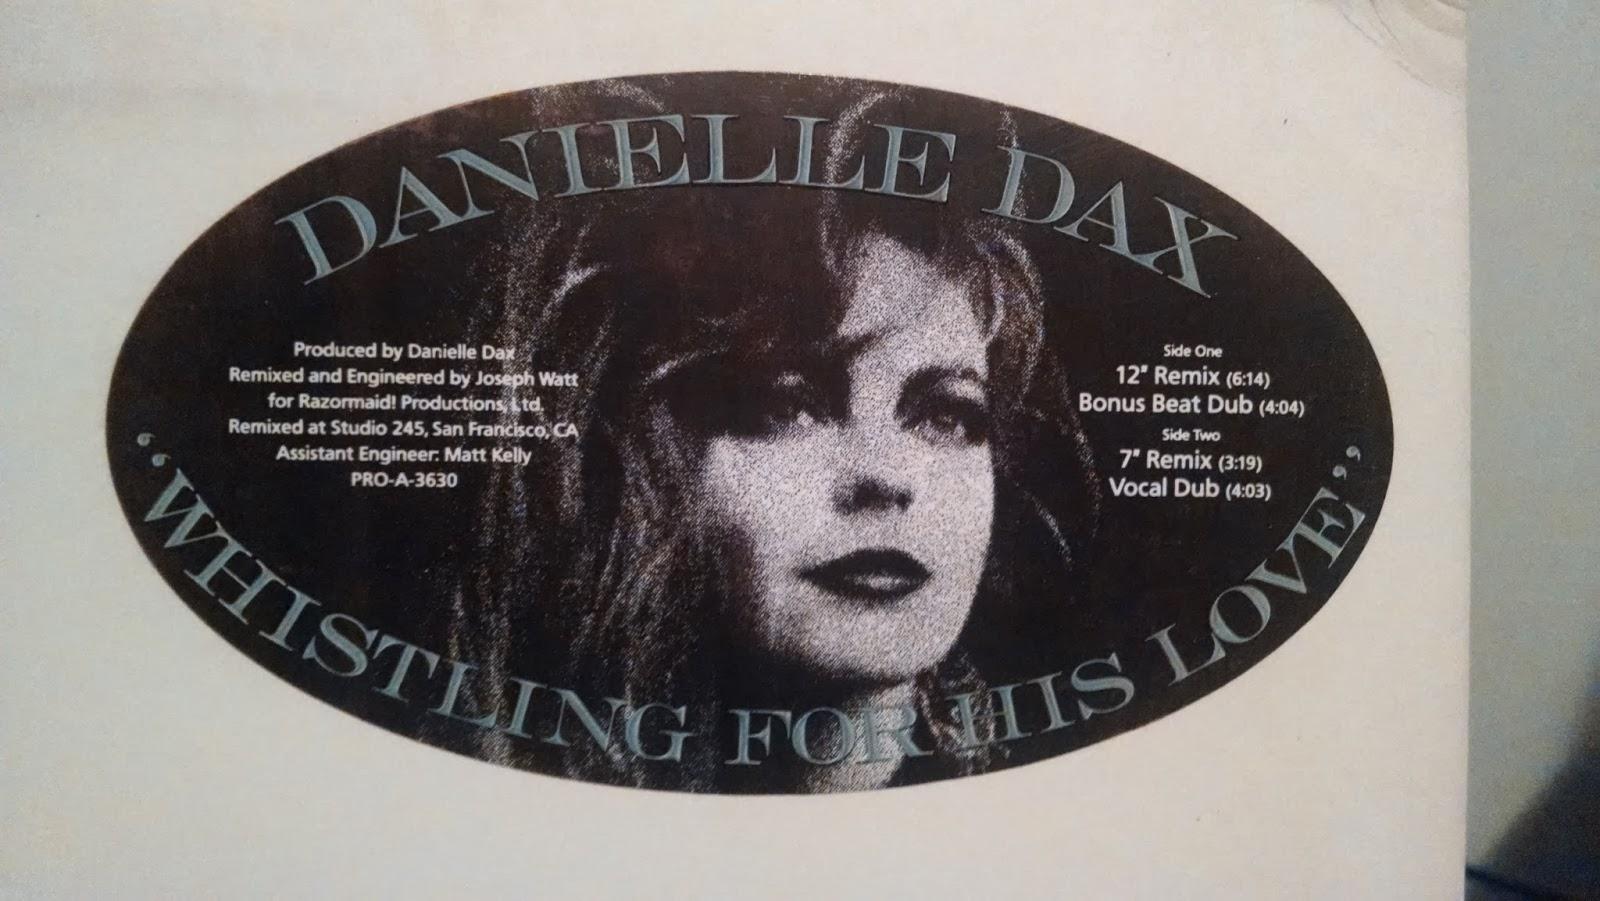 Danielle Dax - Dark Adapted Eye